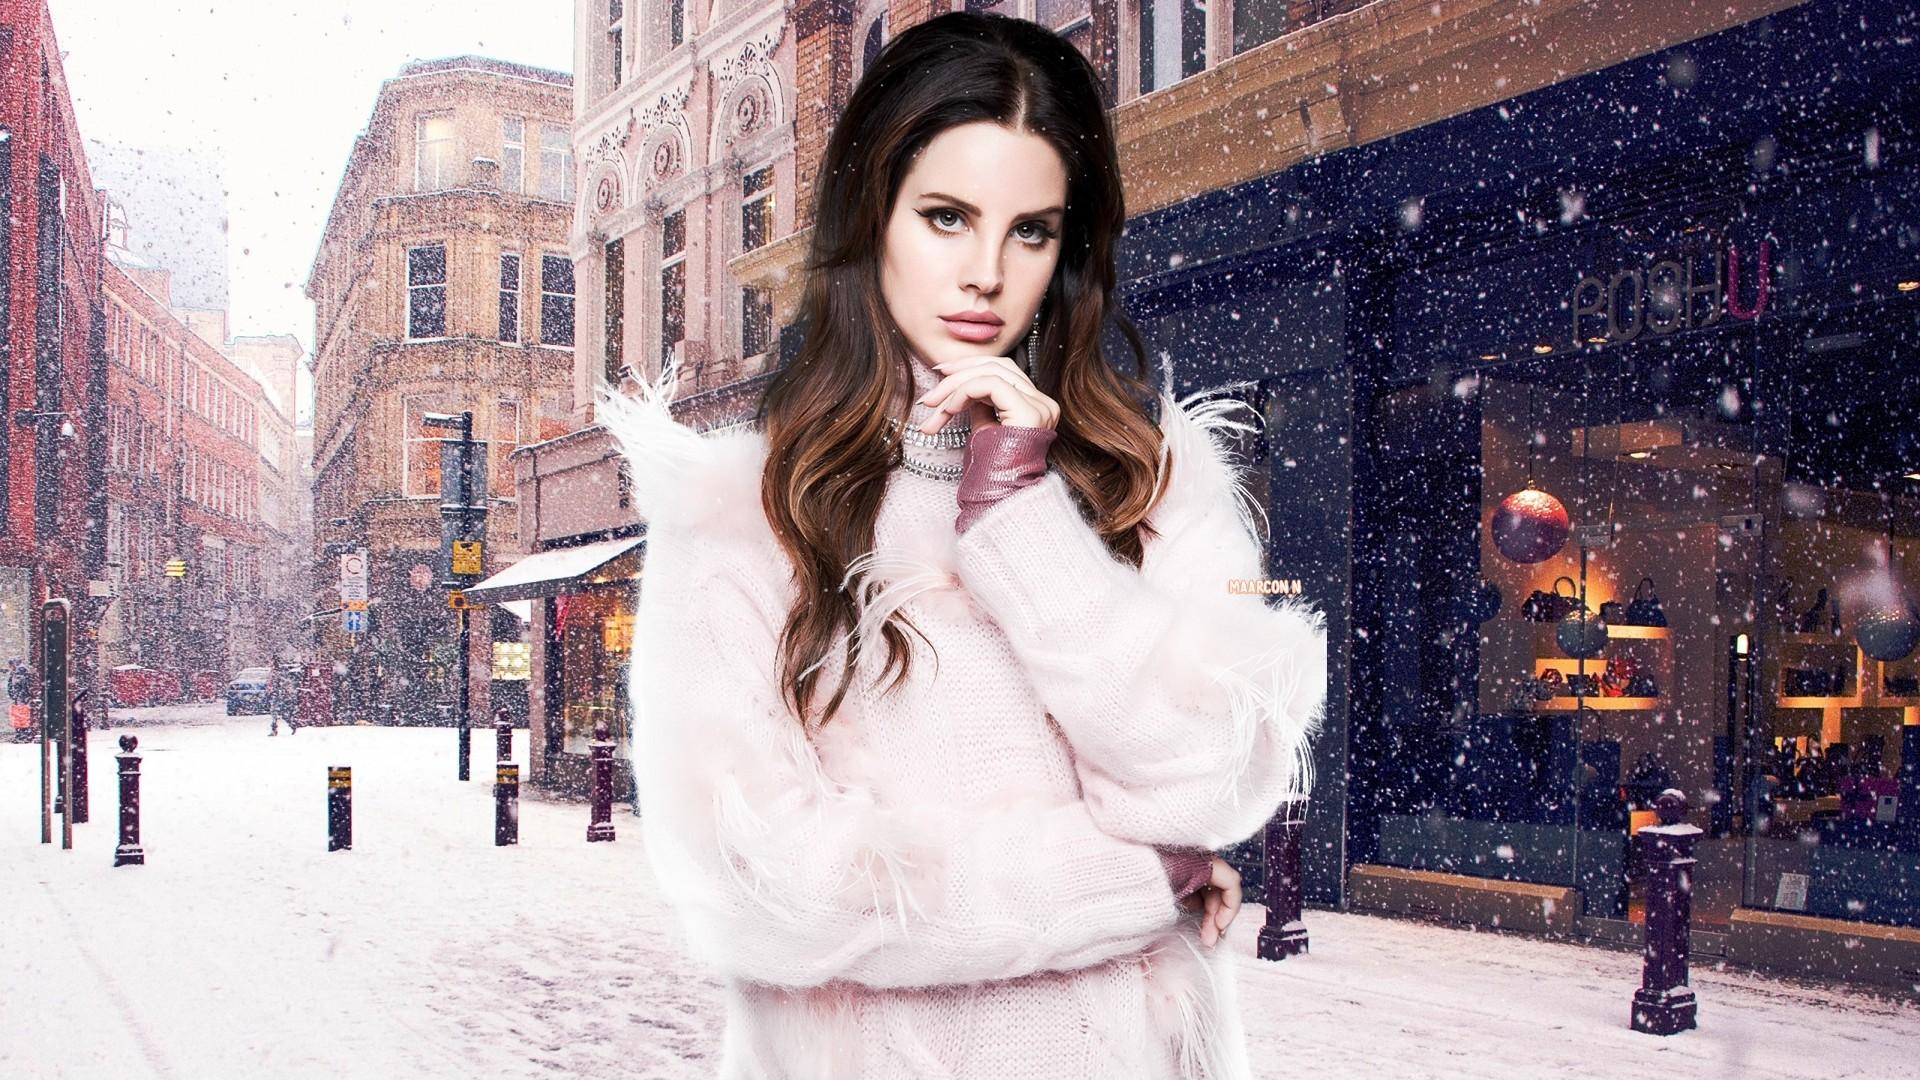 Lana Del Rey Wallpaper for pc